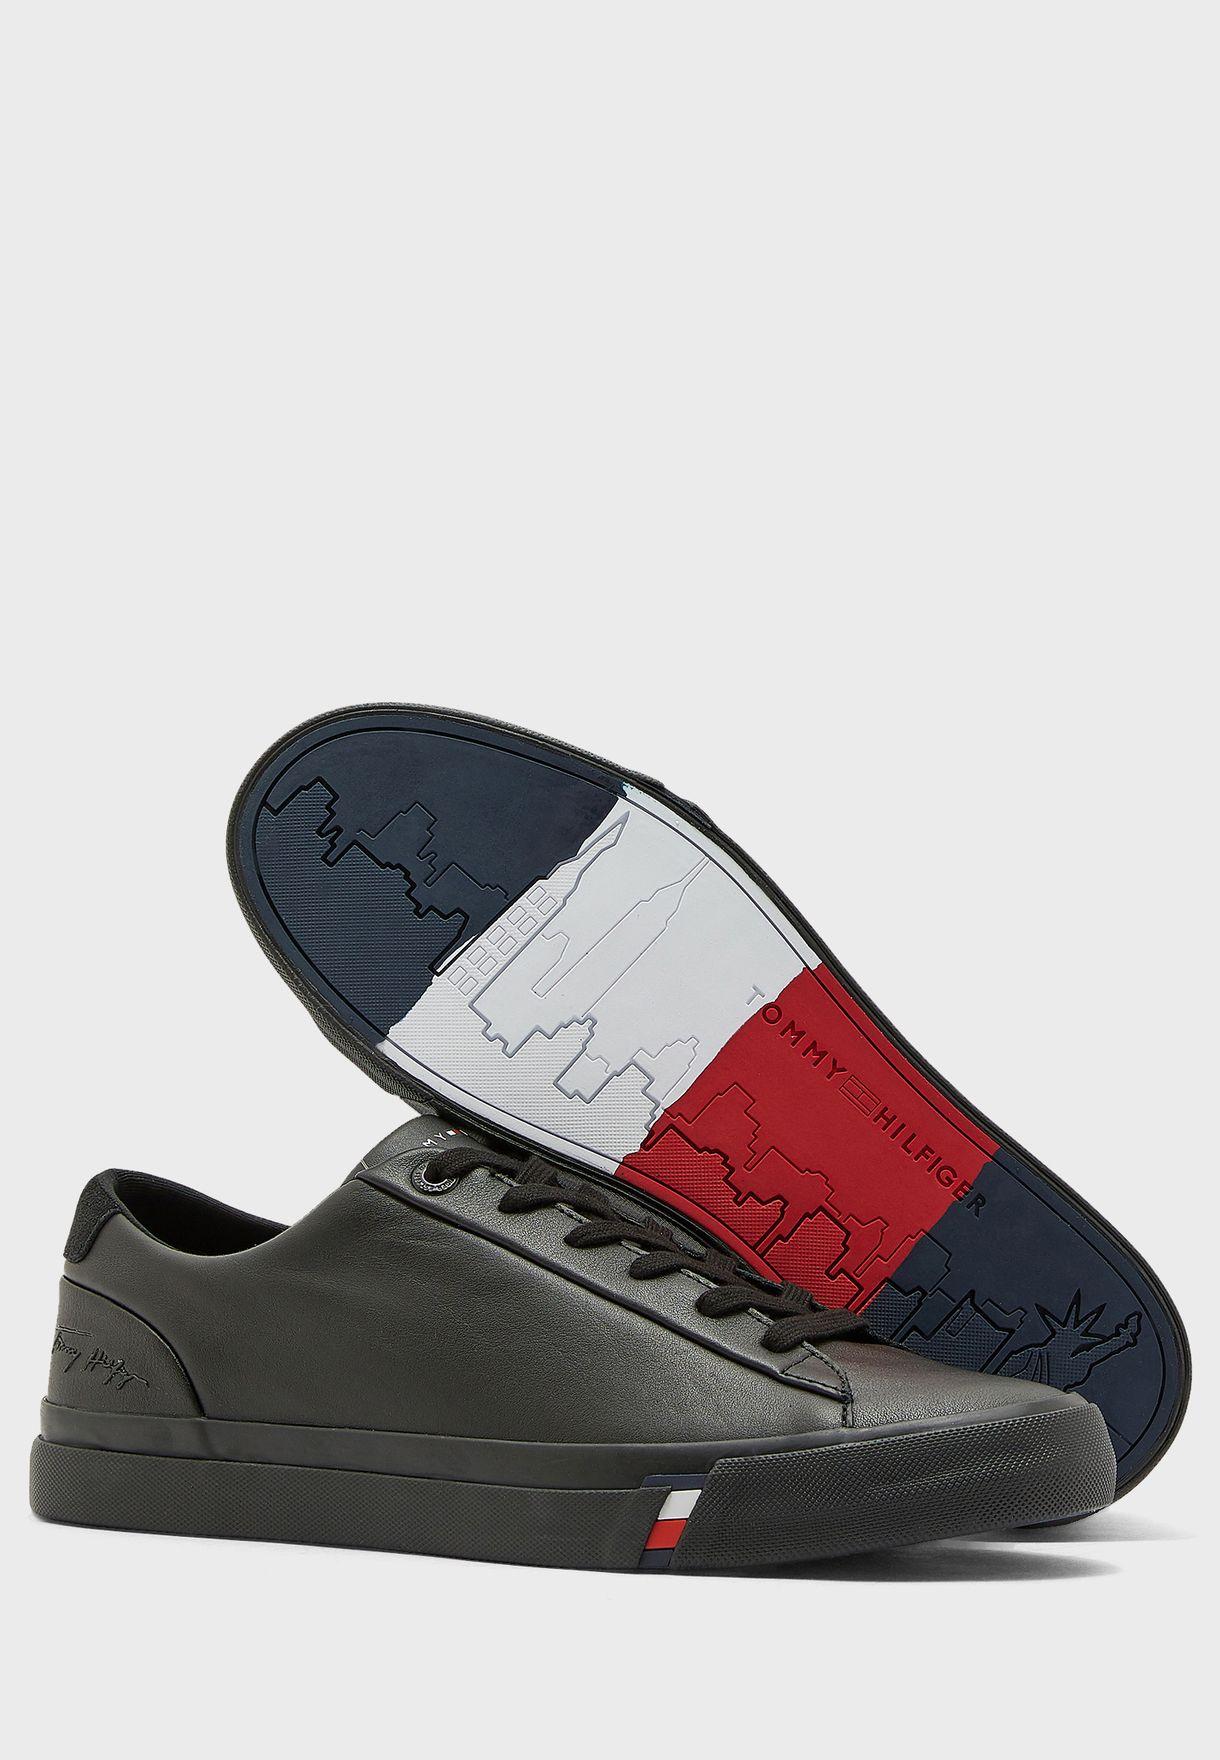 Corporate Sneakers